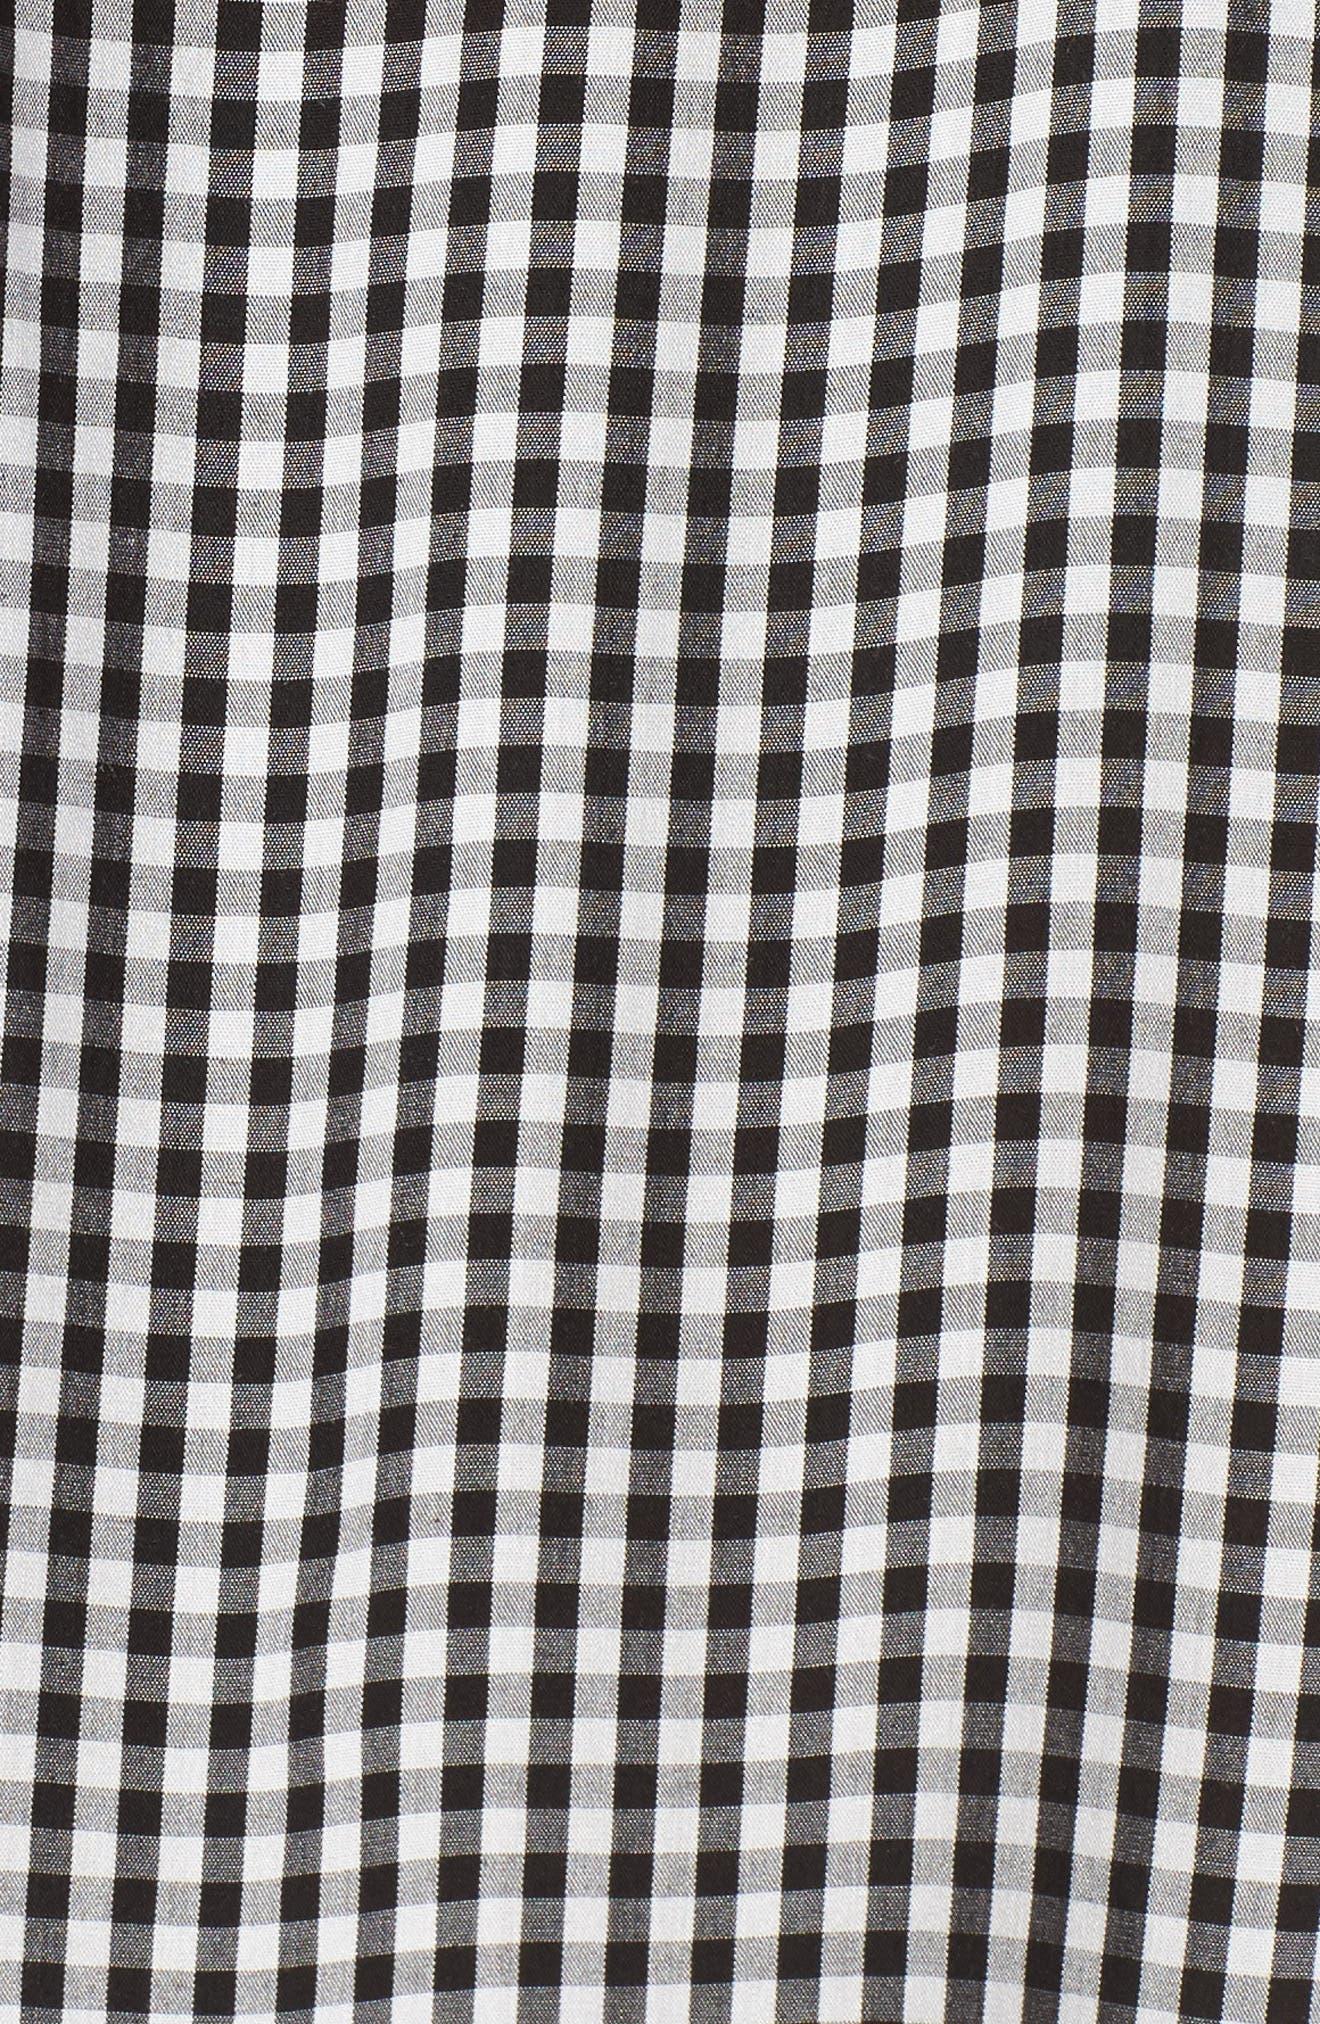 Off the Shoulder Gingham Dress,                             Alternate thumbnail 5, color,                             Black White Gingham